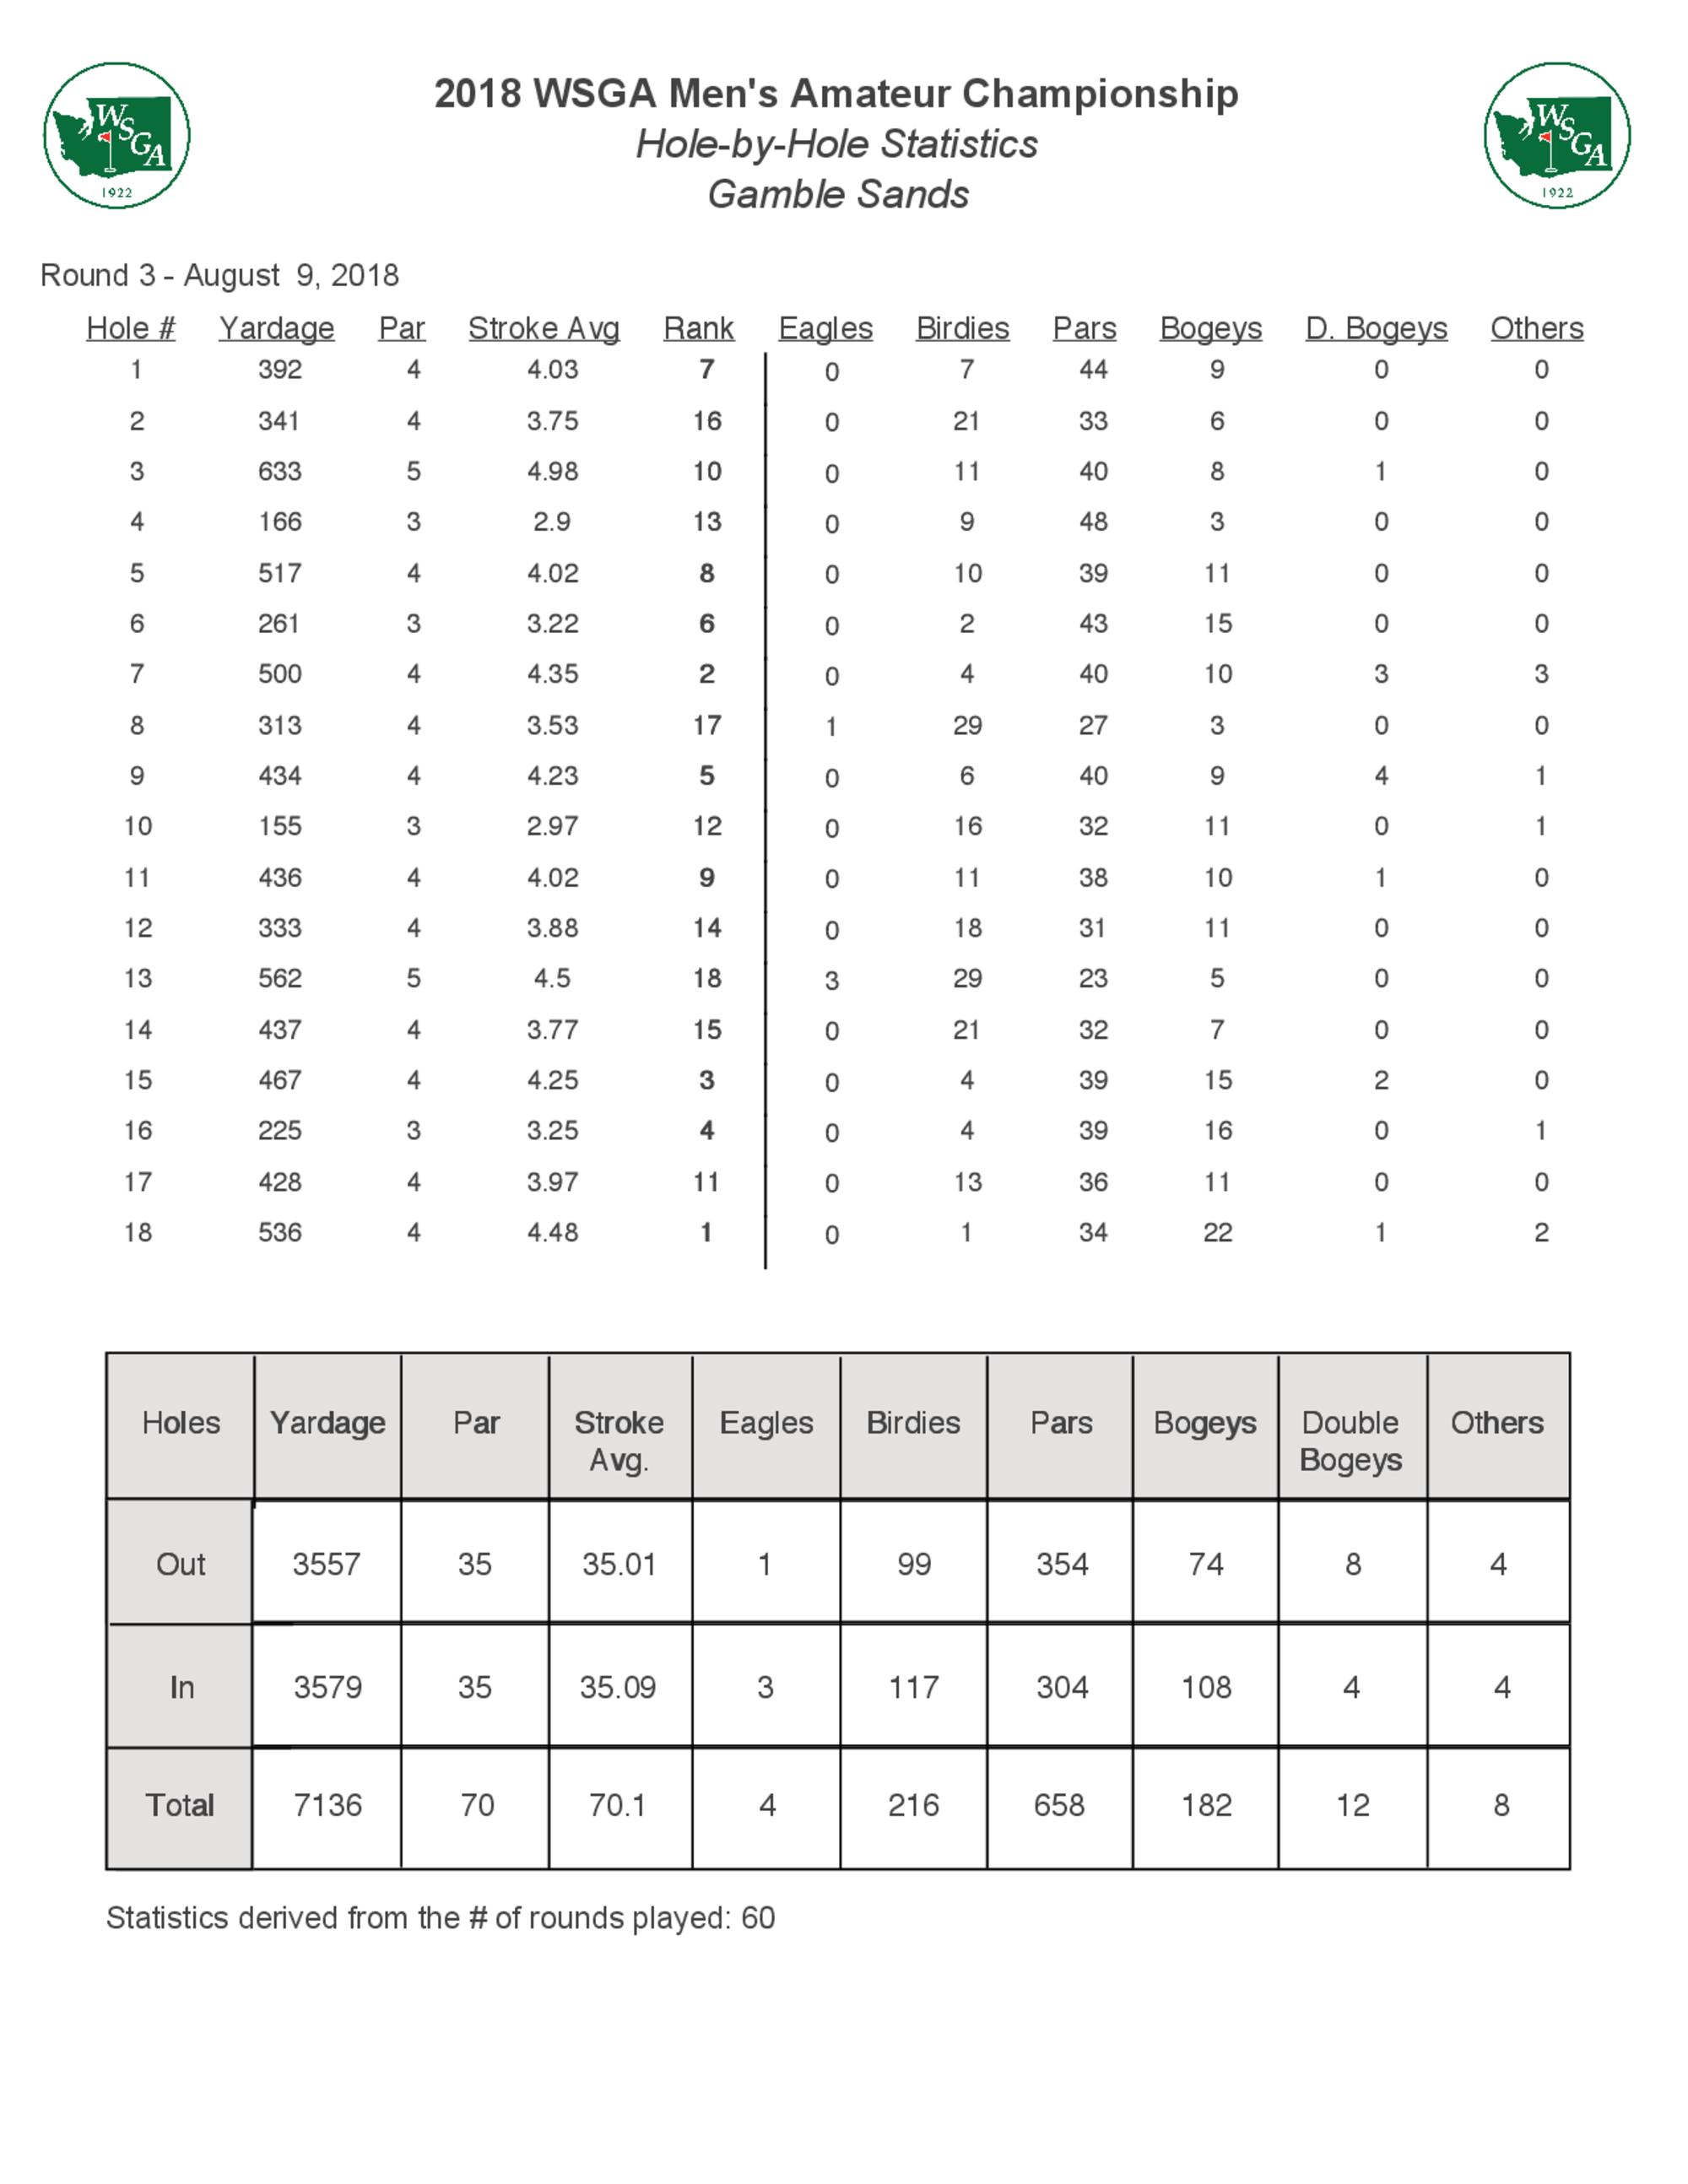 Round 3 course statistics 1